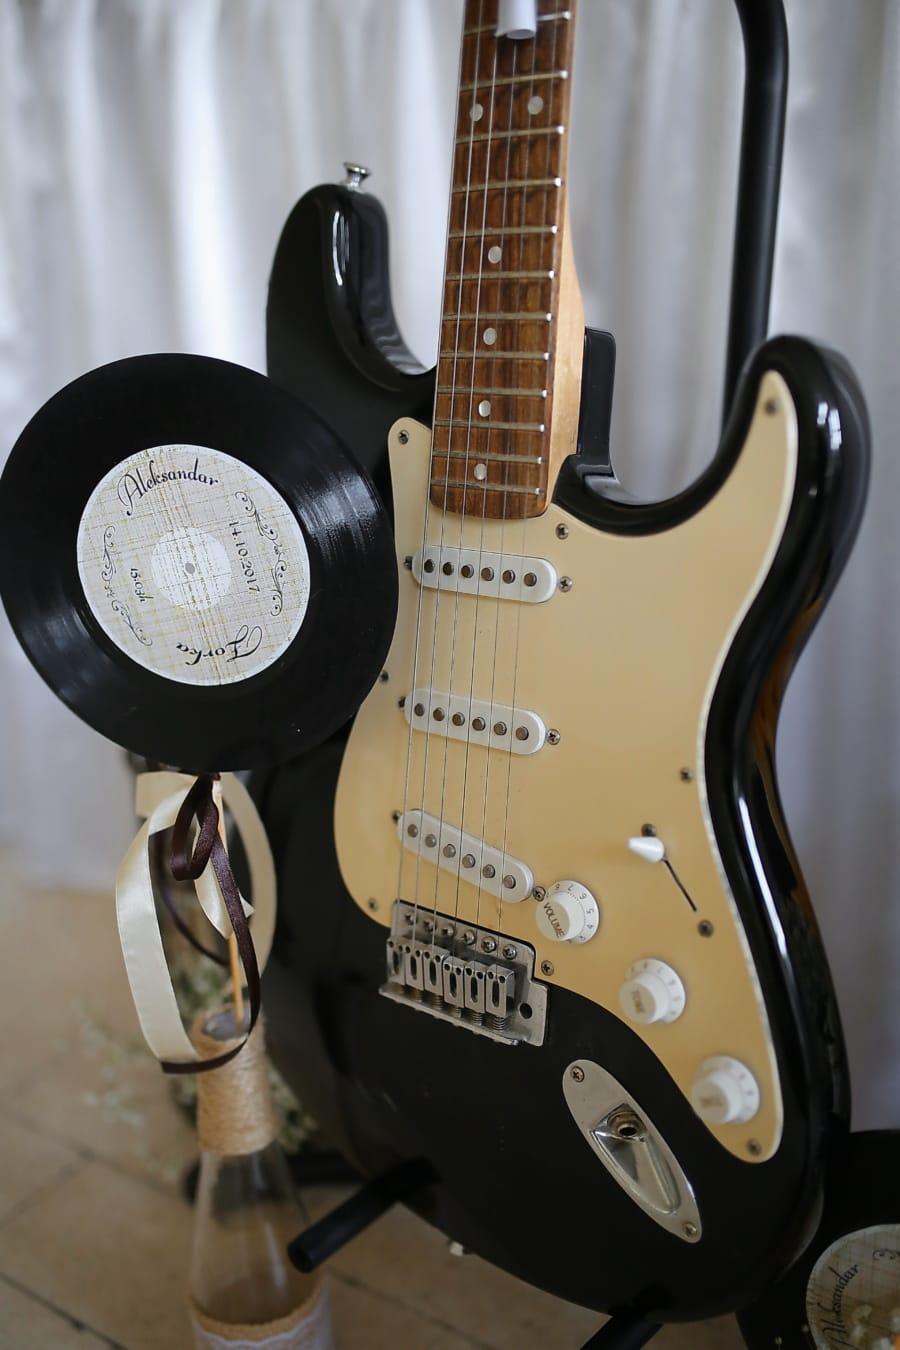 piringan hitam, gitar, melodi, musik, Suara, instrumen, musik, string, klasik, lama